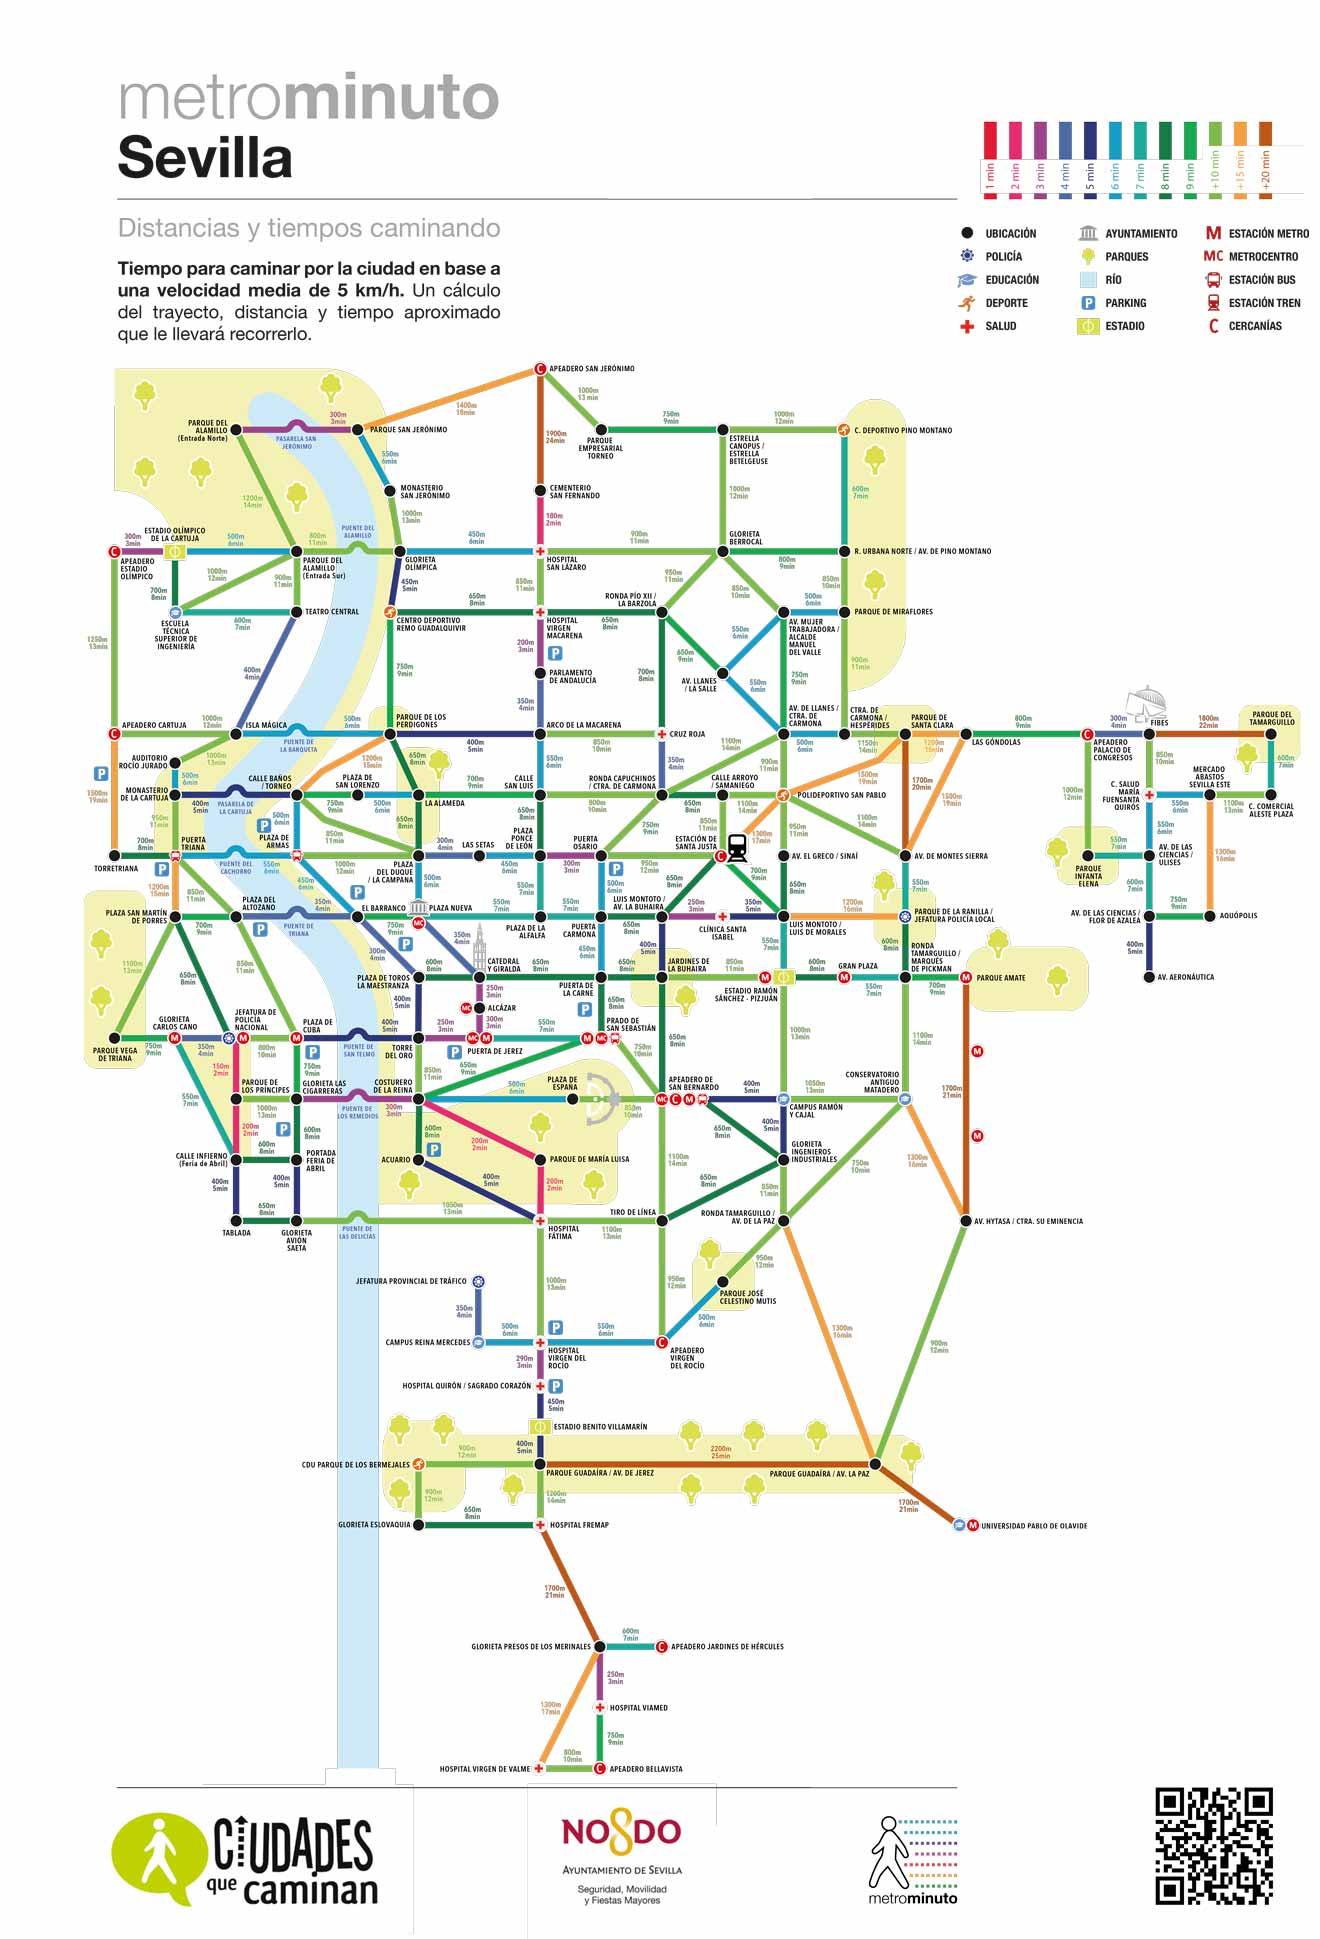 MetrominutoSevilla /Ayto. Sevilla